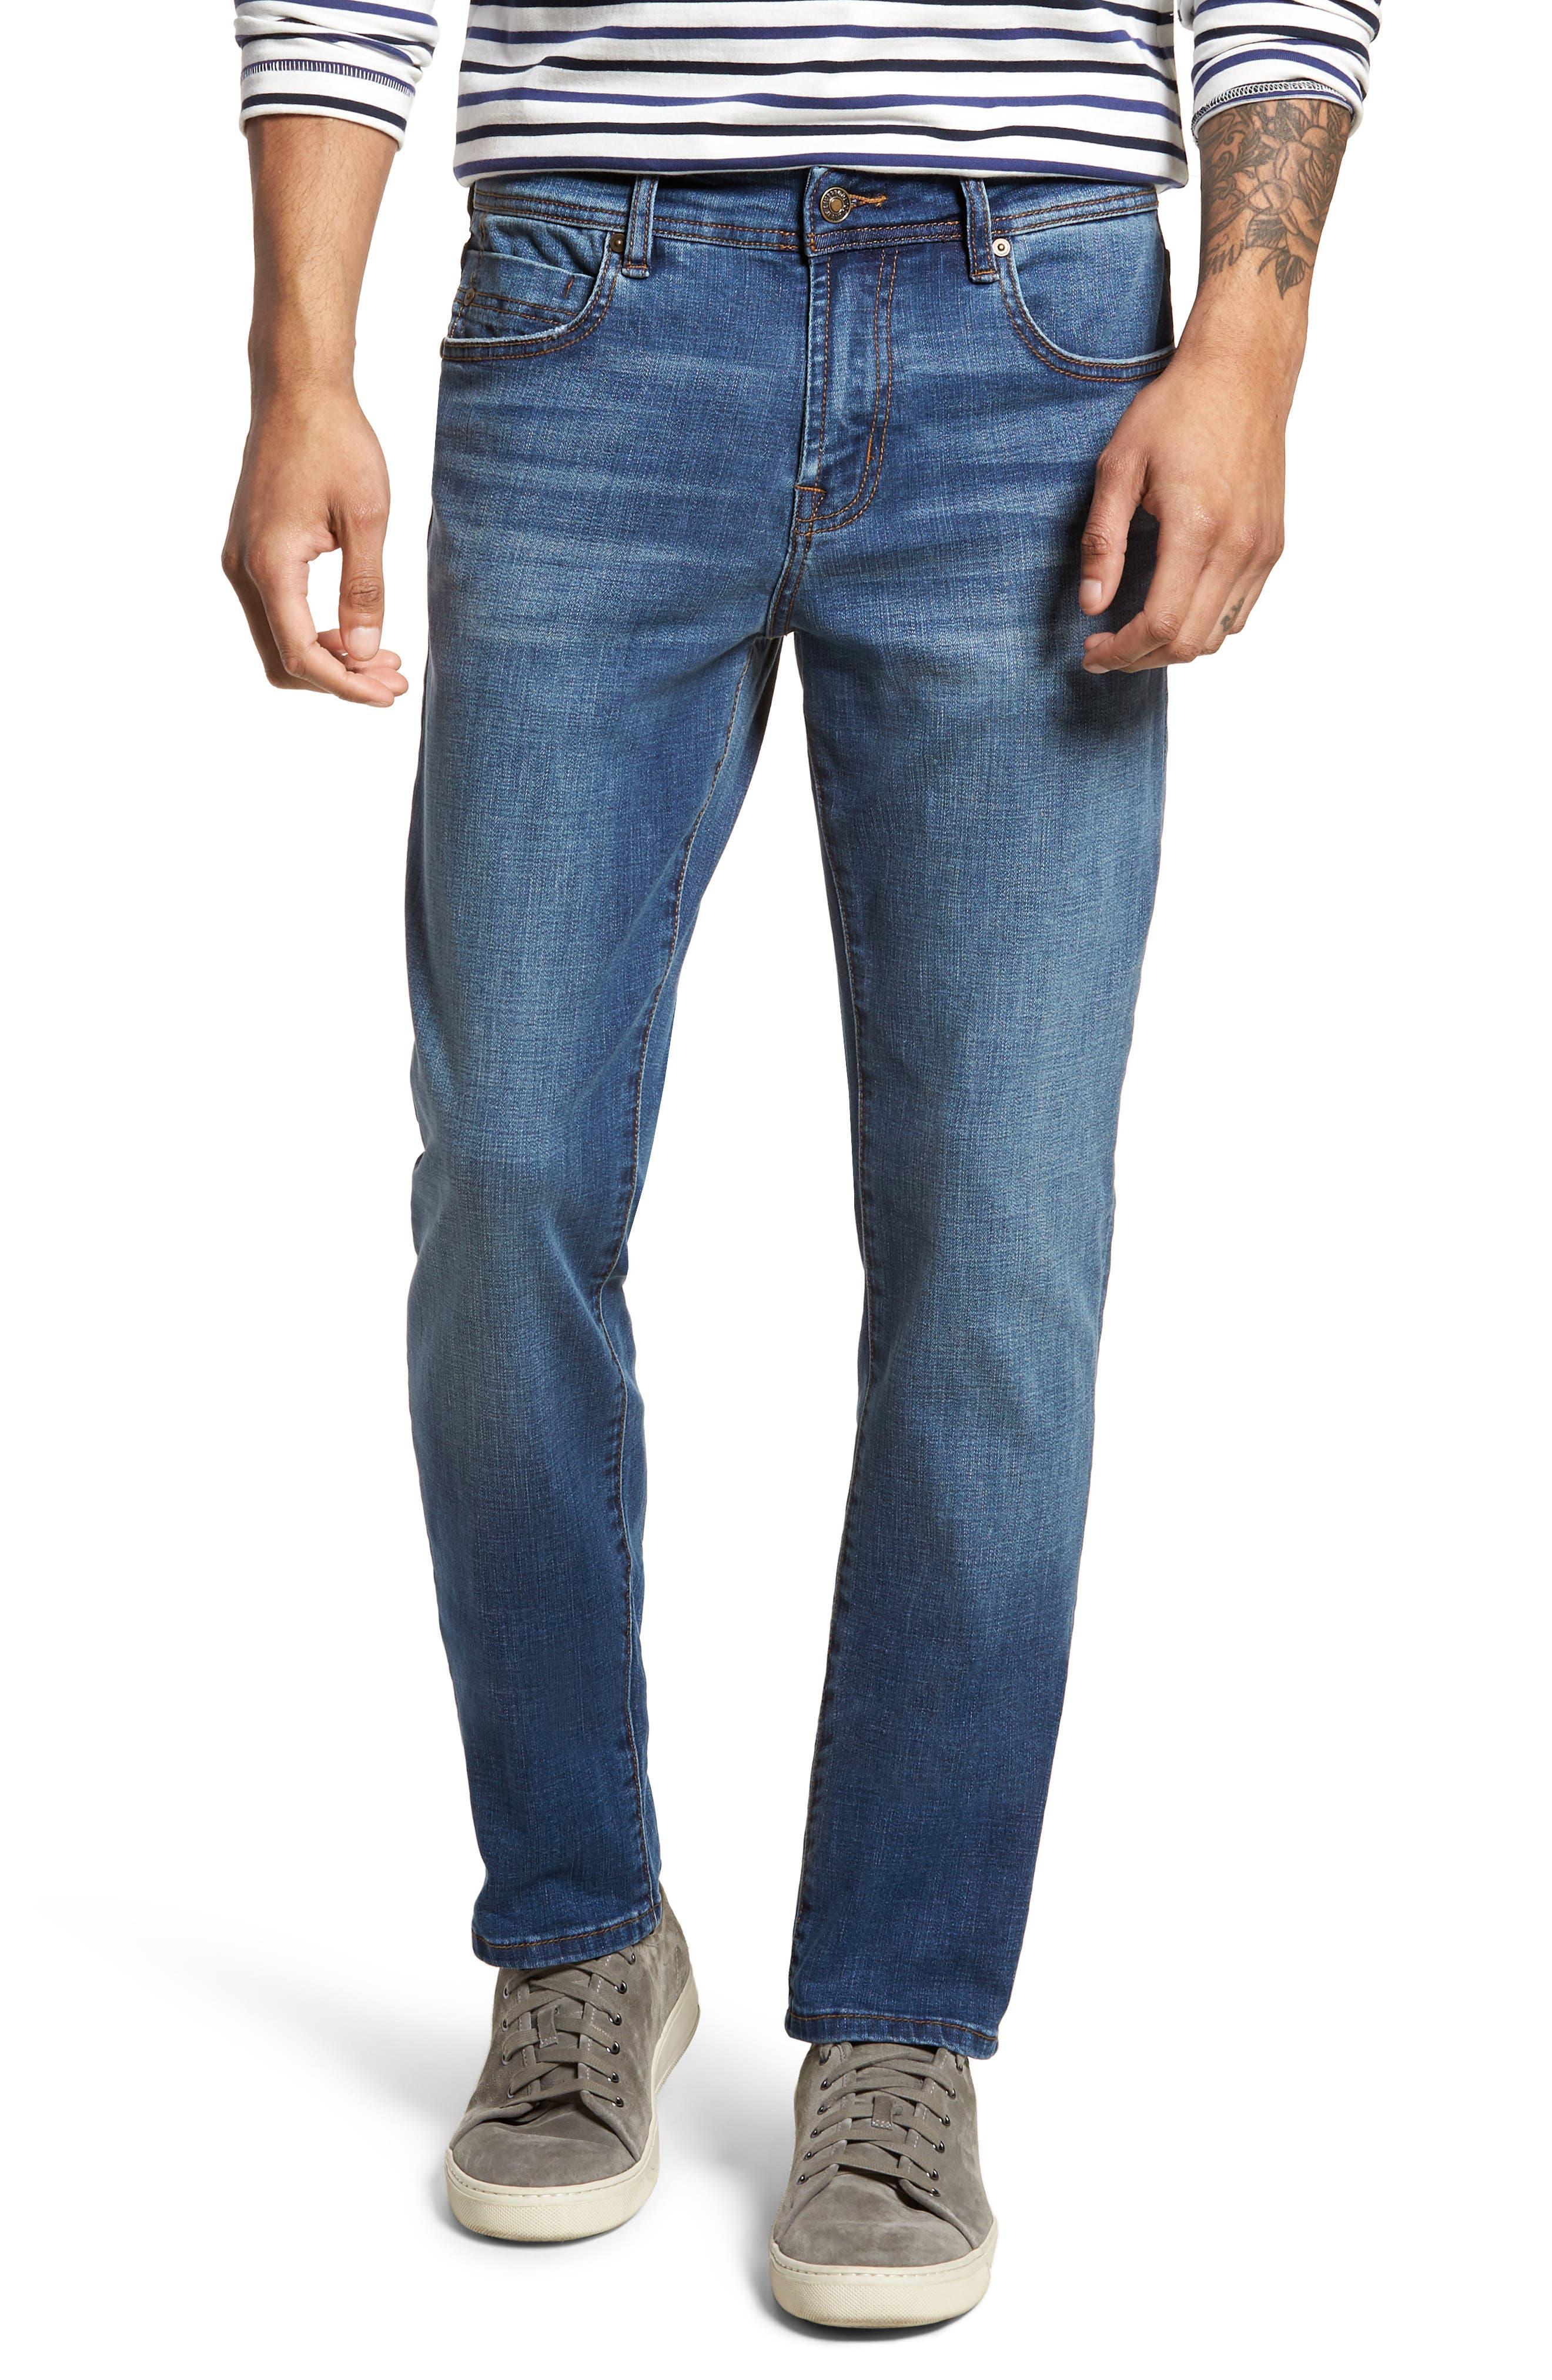 Jeans Co. Kingston Slim Straight Leg Jeans,                             Main thumbnail 1, color,                             HIGHLANDER MID